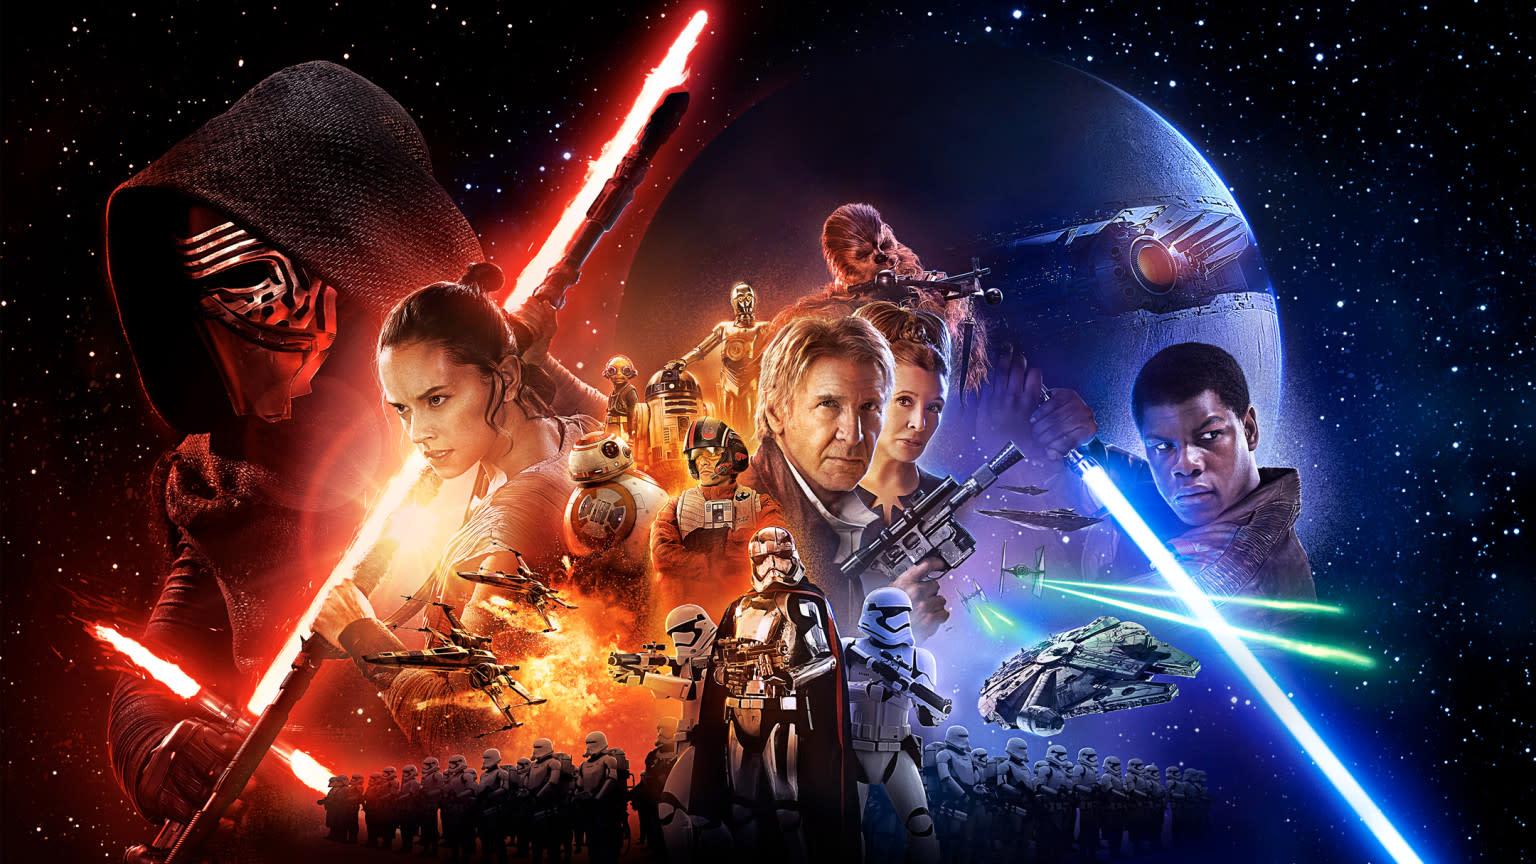 Critics of 'Star Wars: The Force Awakens' blast new film – here's what they said